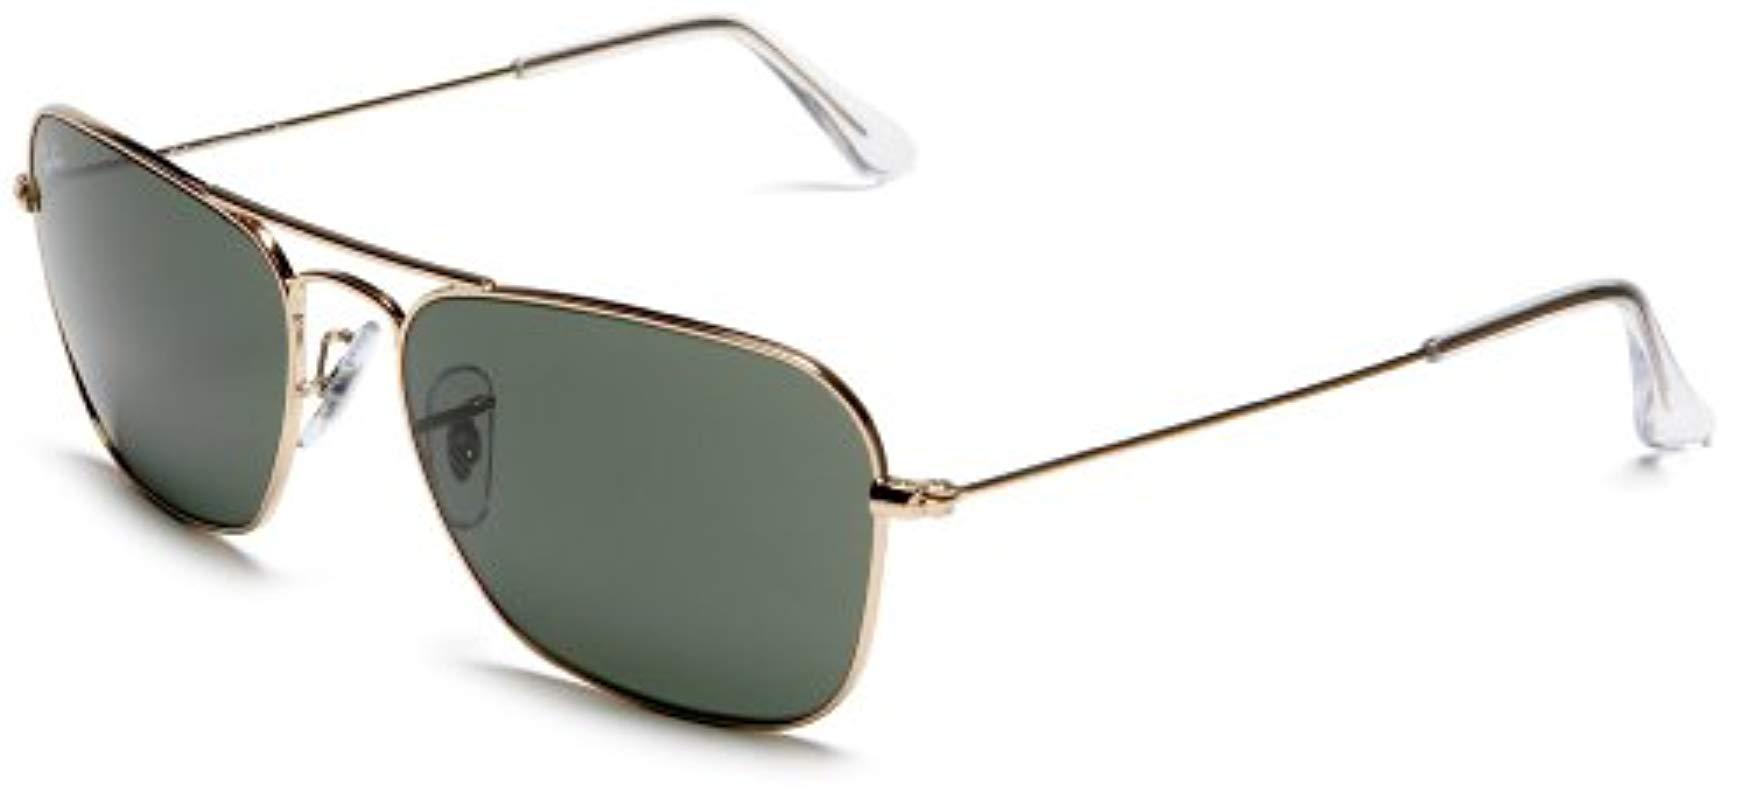 0603fa1712d Lyst - Ray-Ban Rb3136 Caravan Sunglasses - Save 34.640522875817%